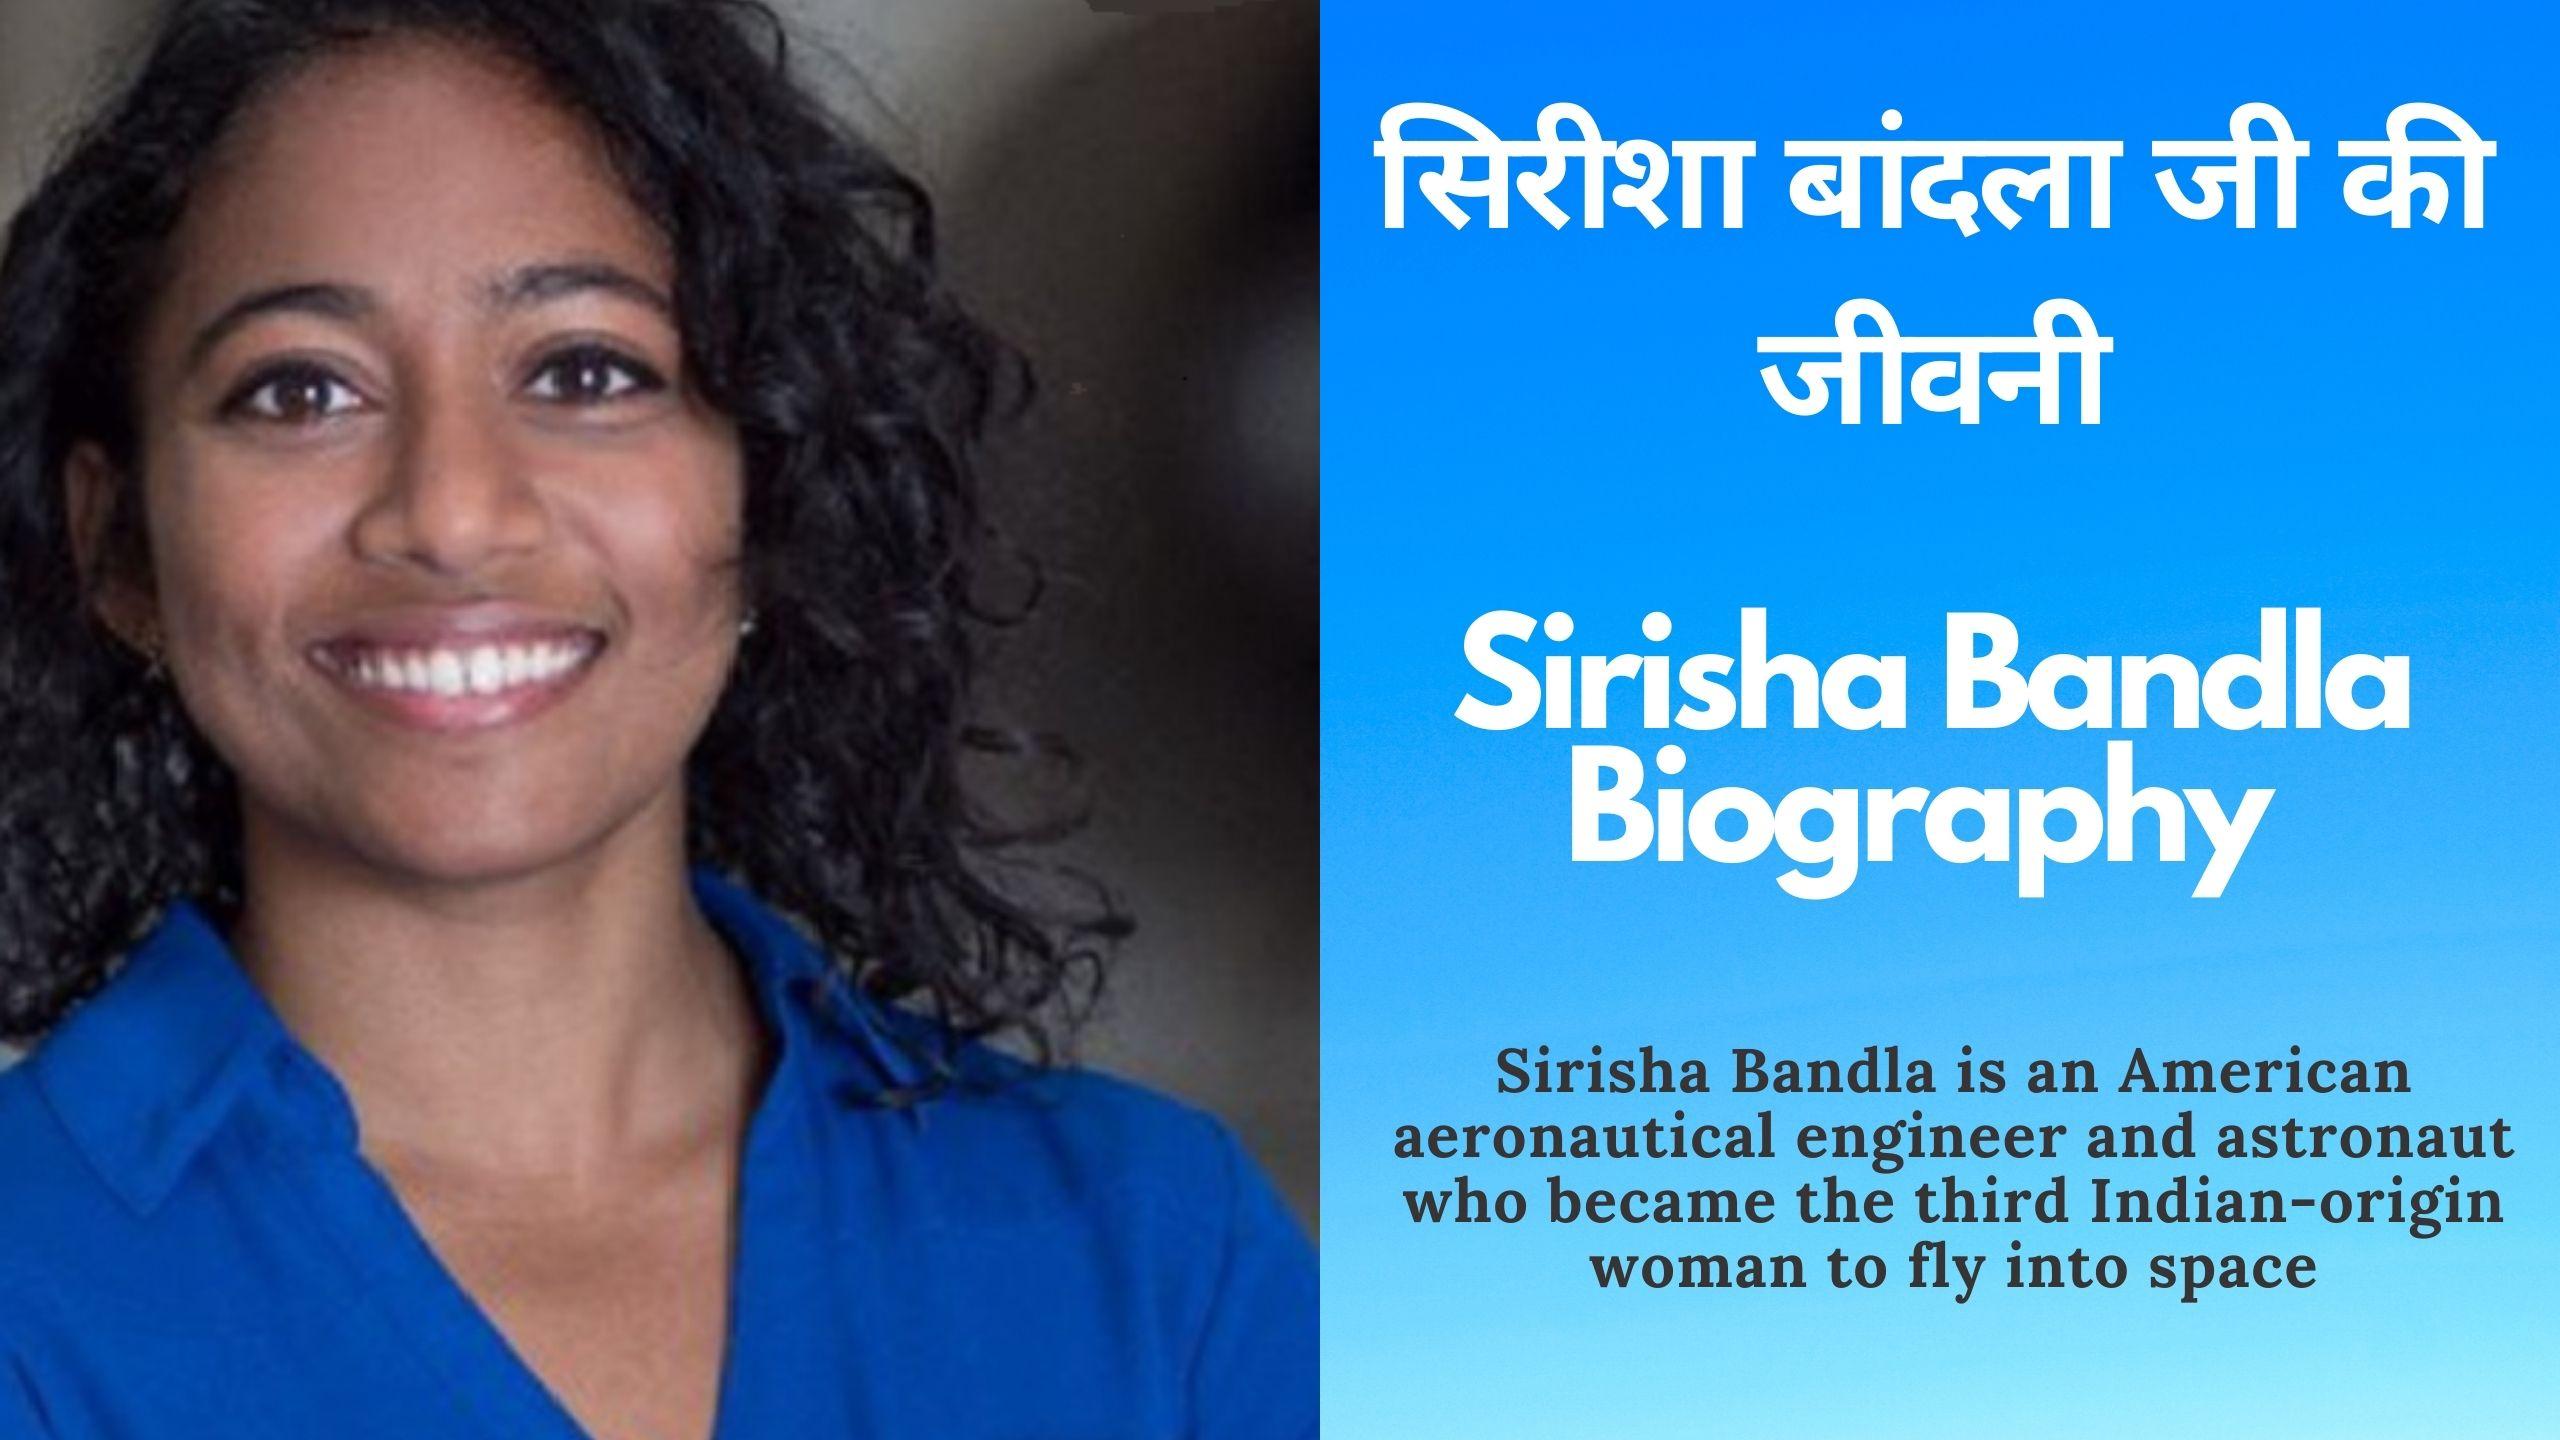 Sirisha Bandla Biography सिरीशा बांदला जी की जीवनी